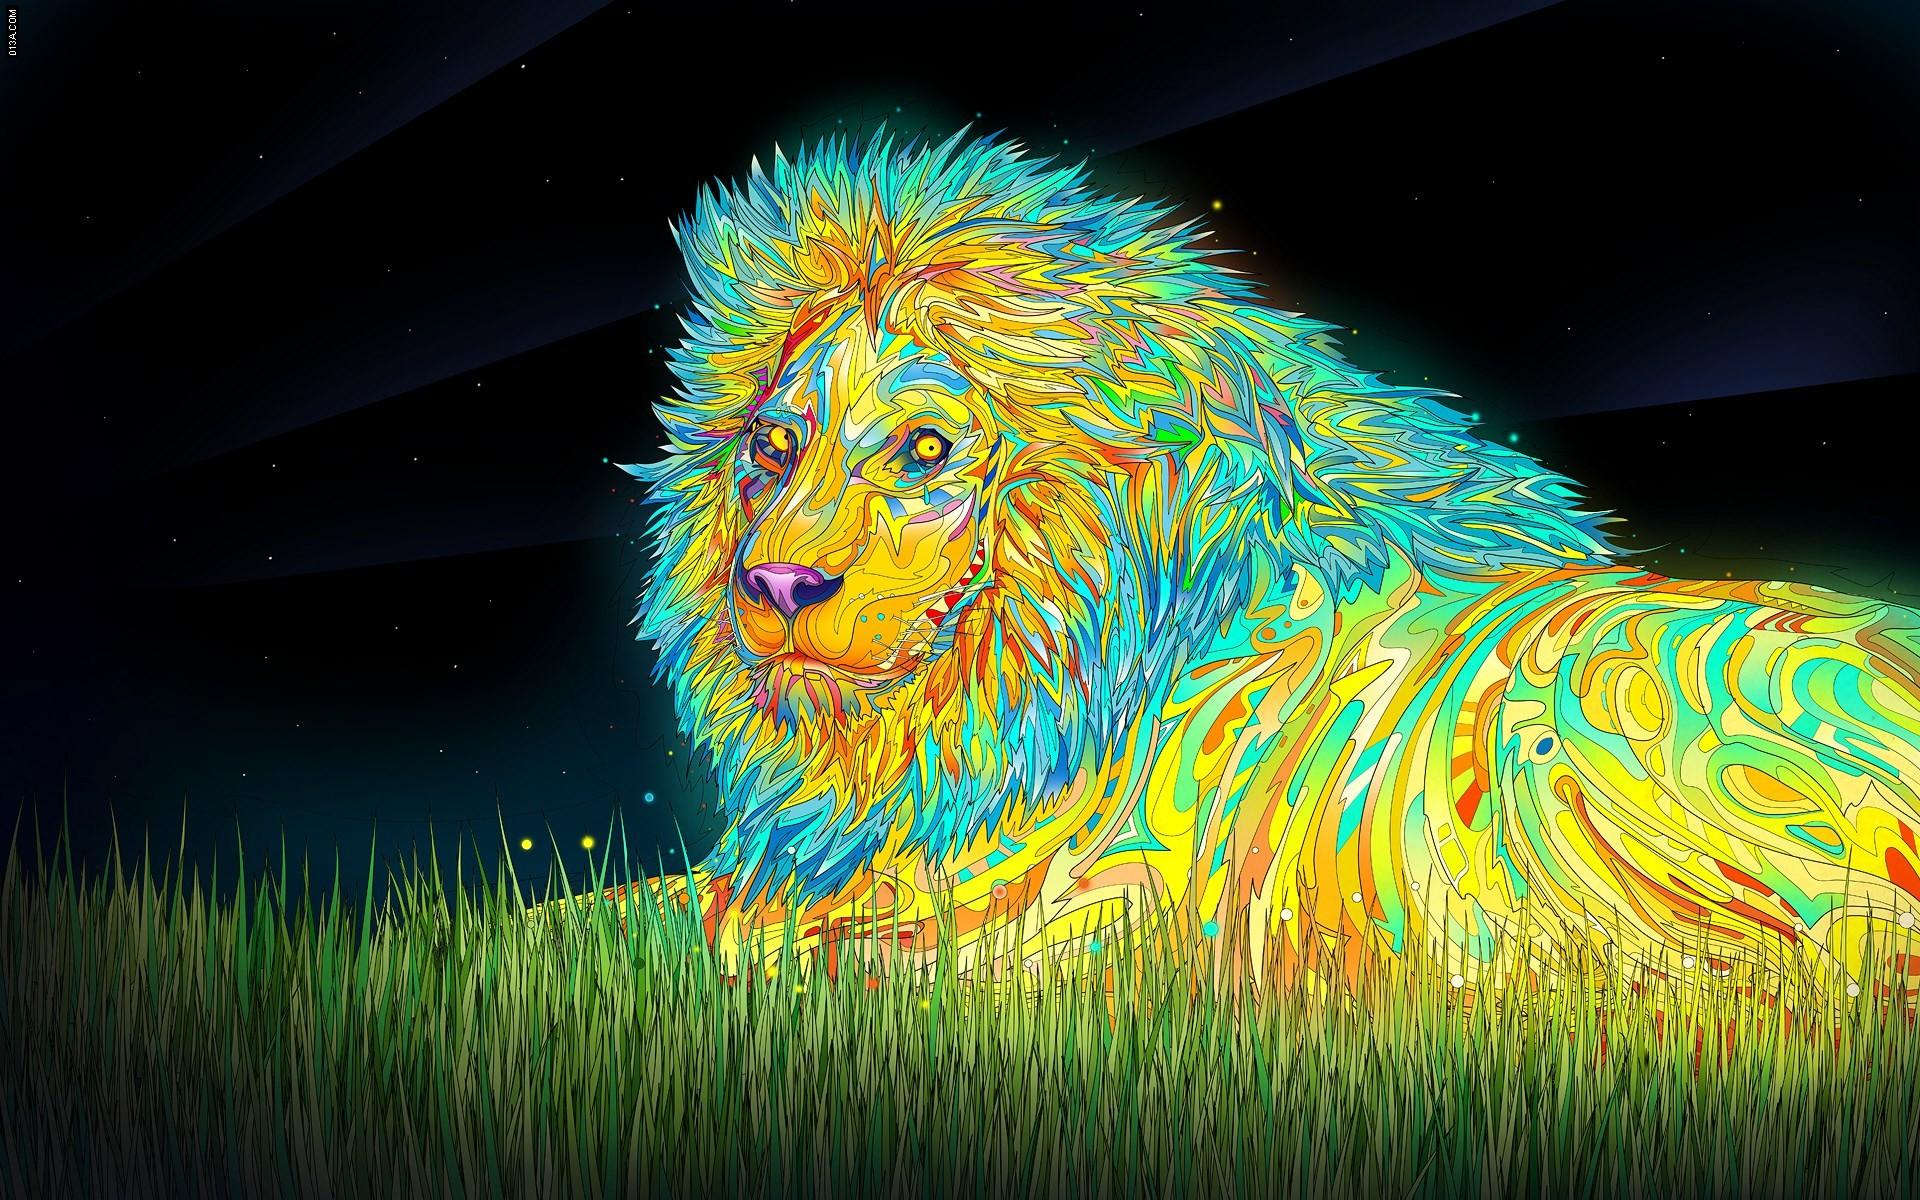 Rainbow Lion Wallpaper (57+ images)